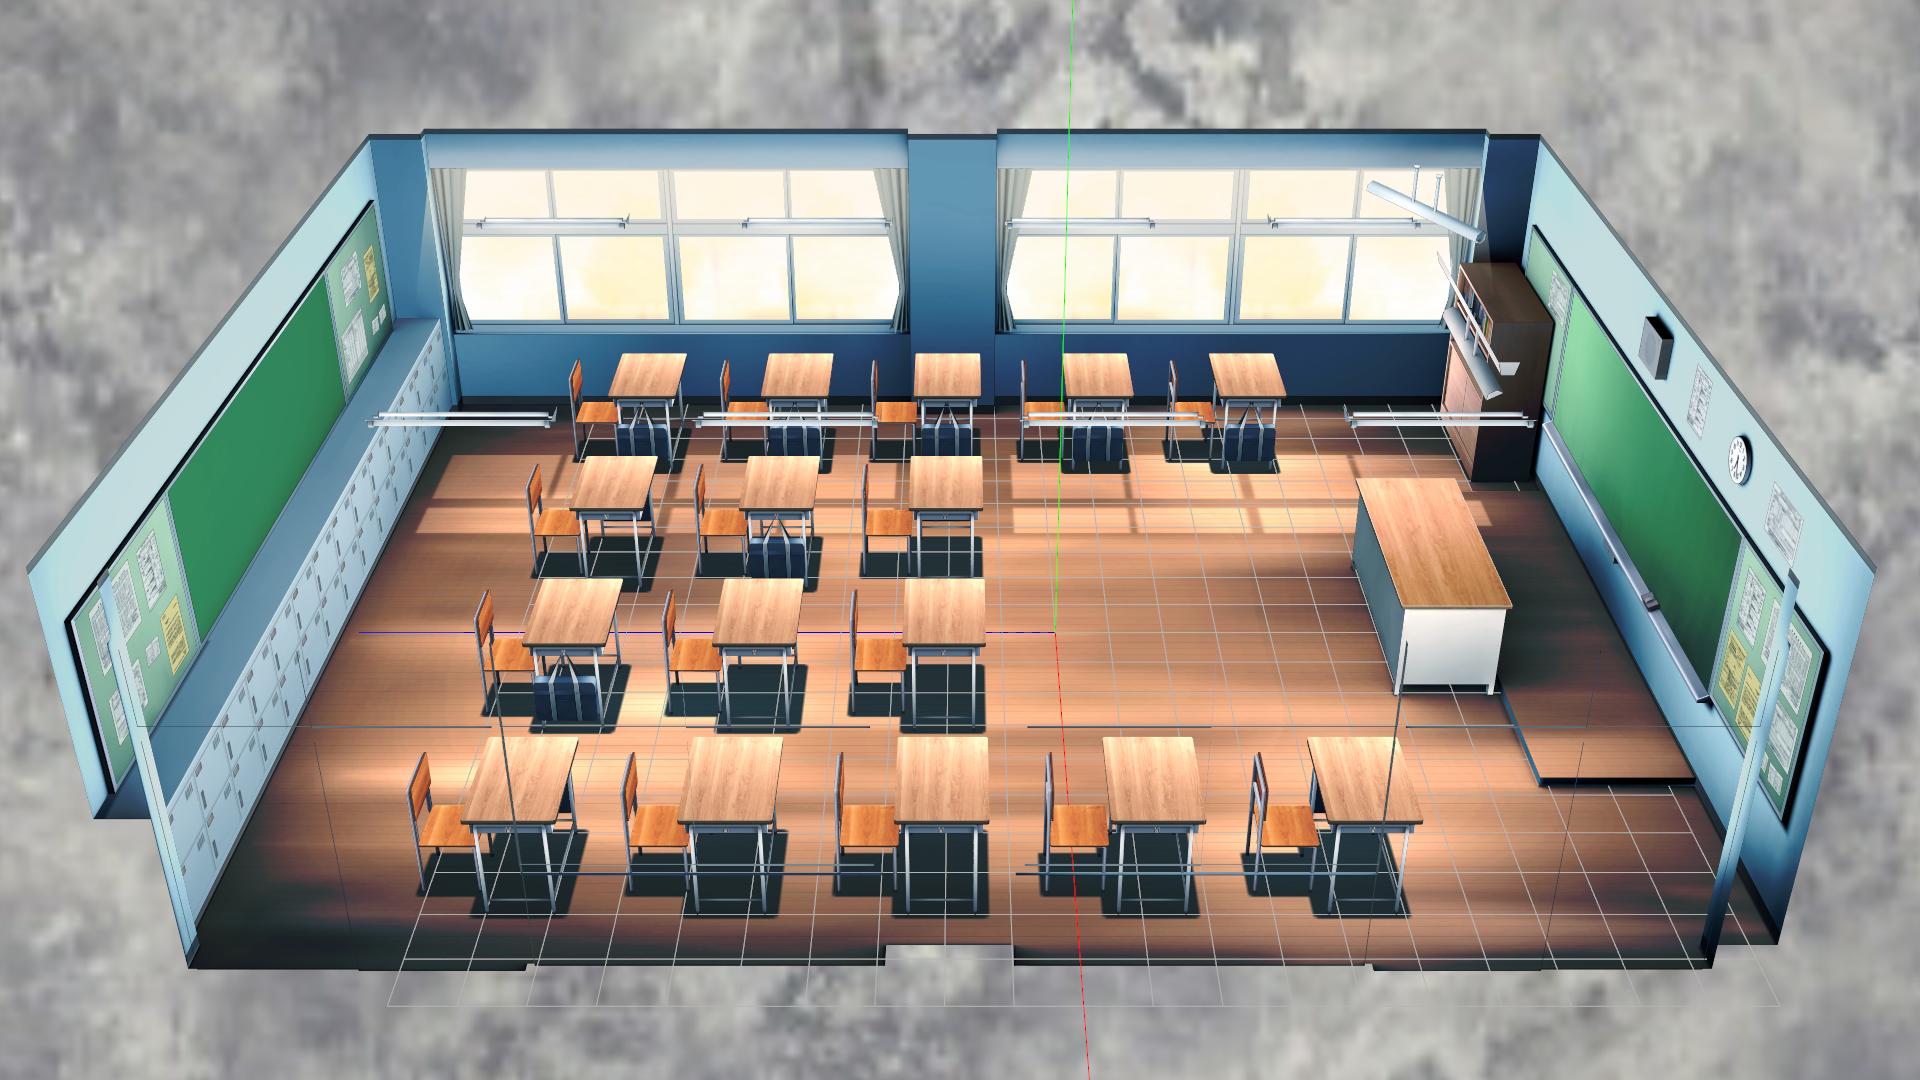 [DL] MMD School Classroom 2 Stage by Maddoktor2